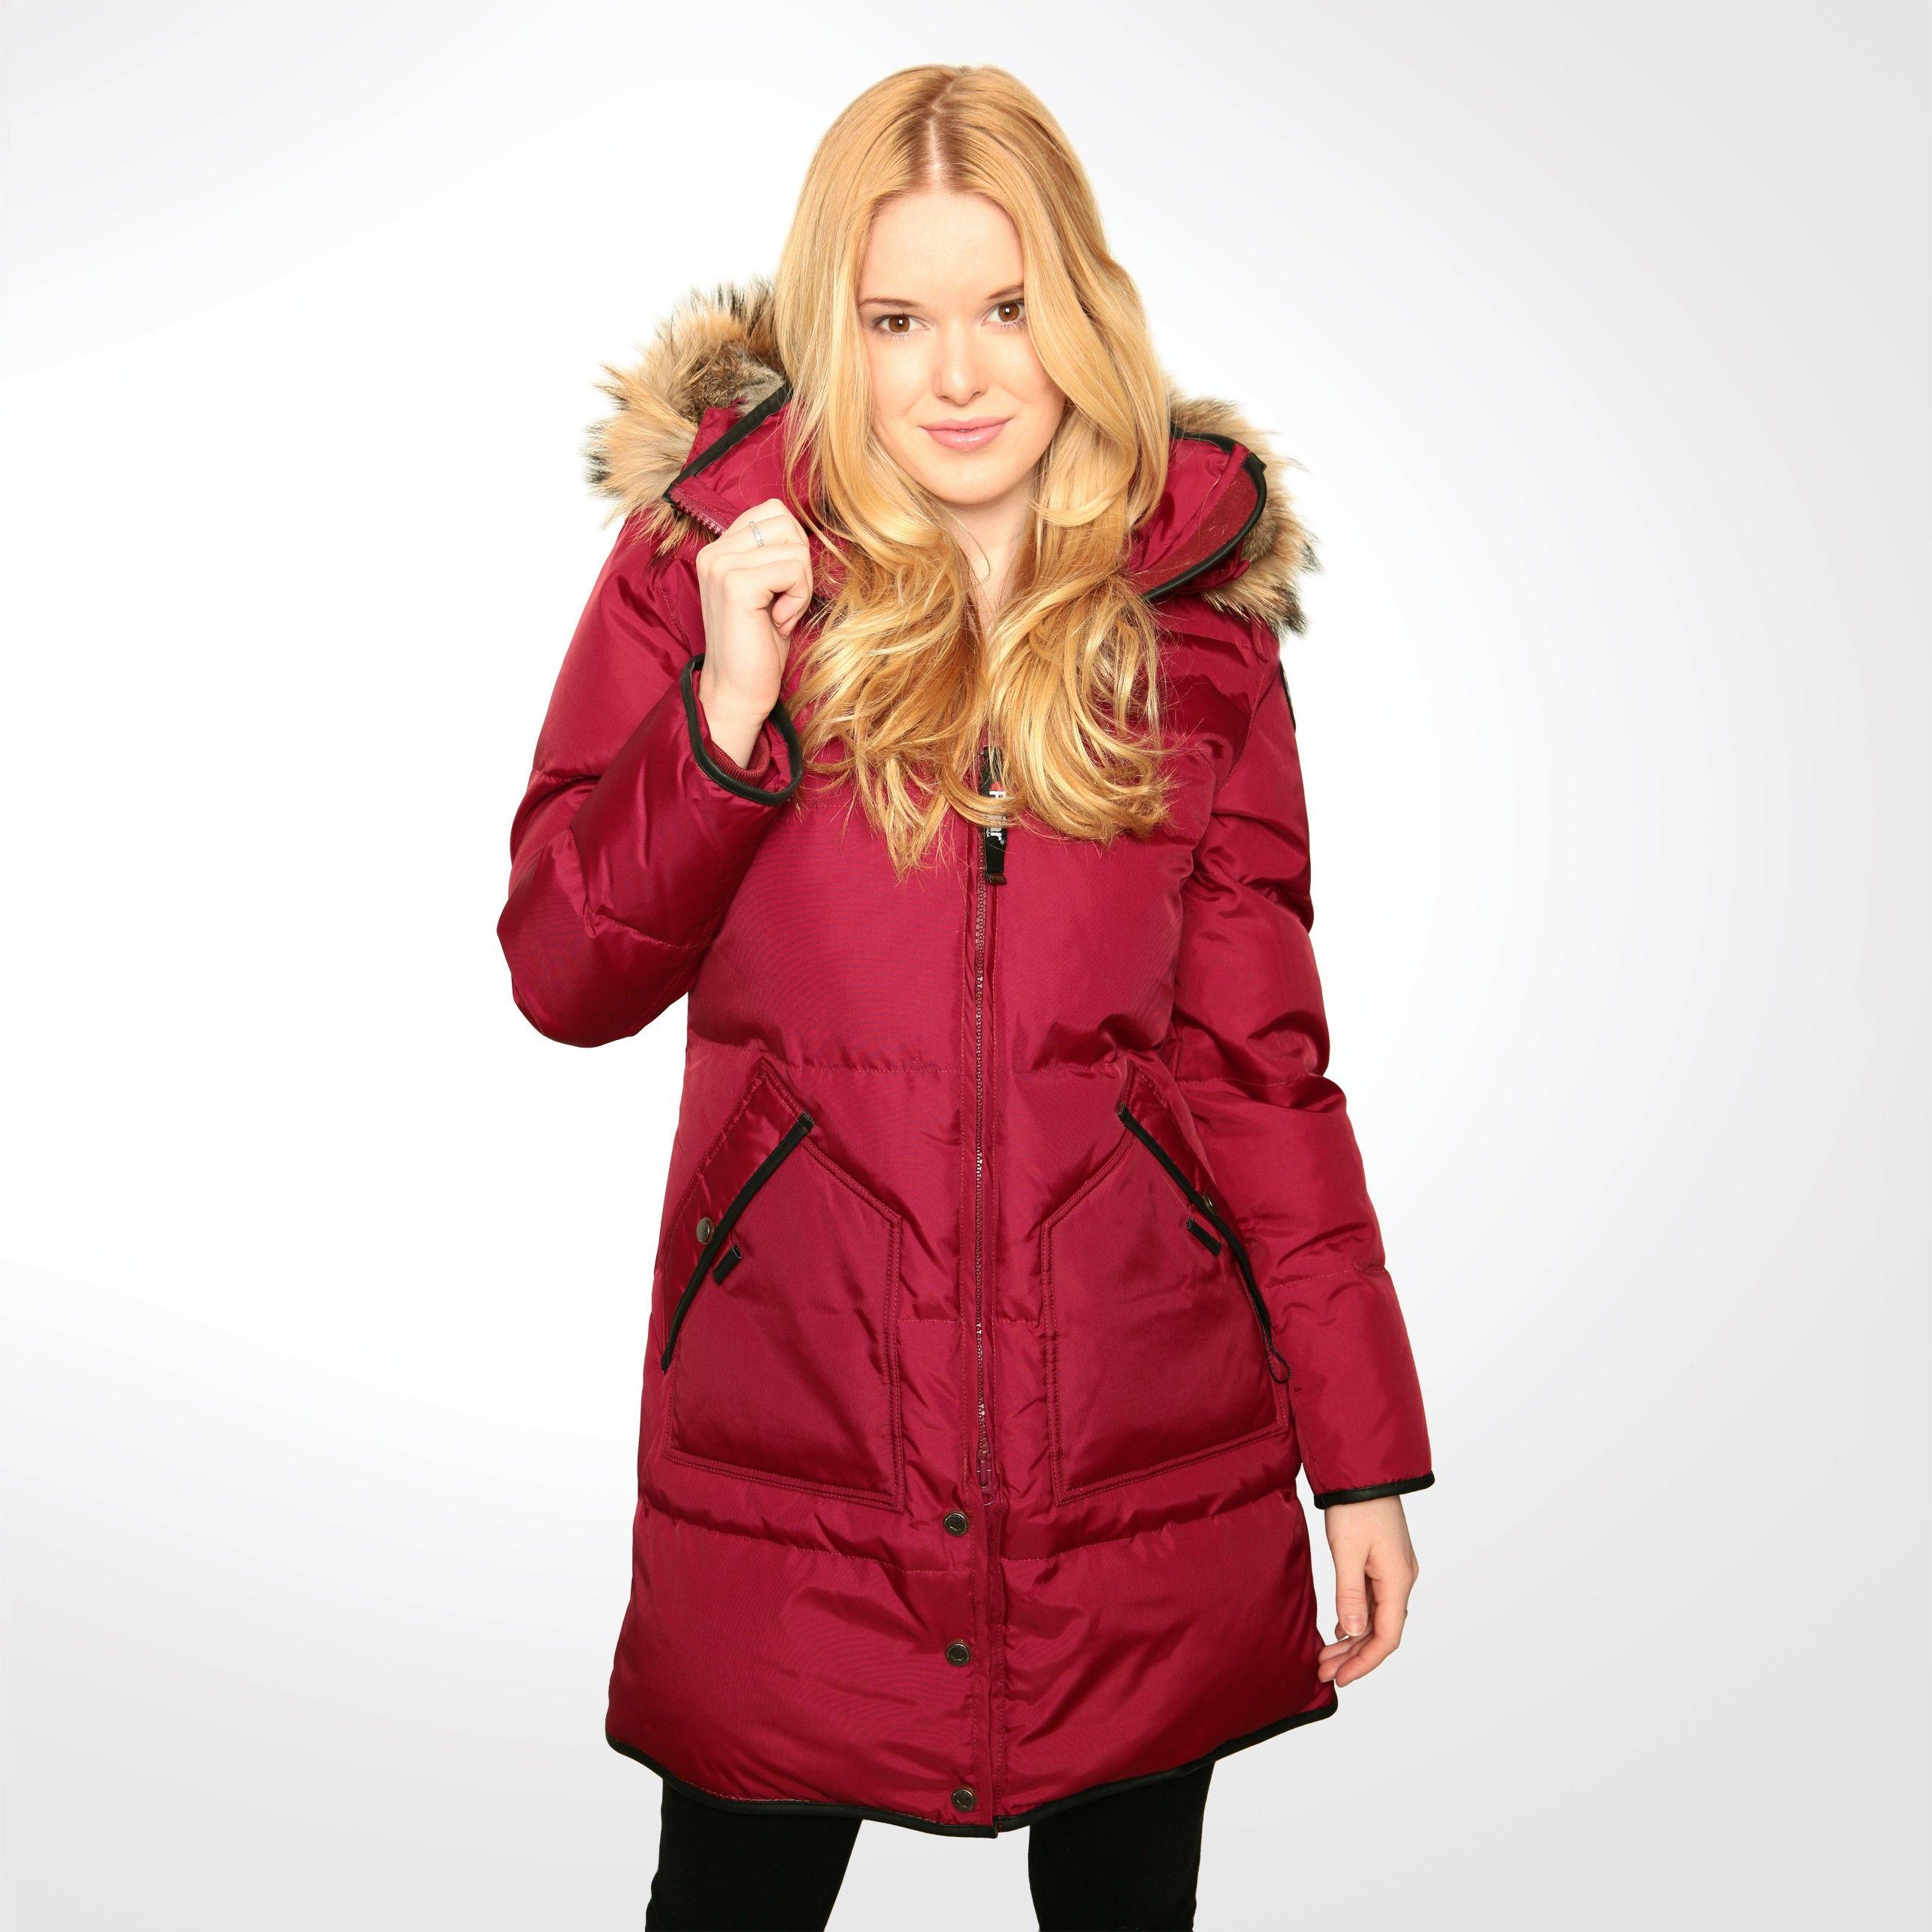 Cougar Red | Pajar USA | winter fashion | Pinterest | Winter ...